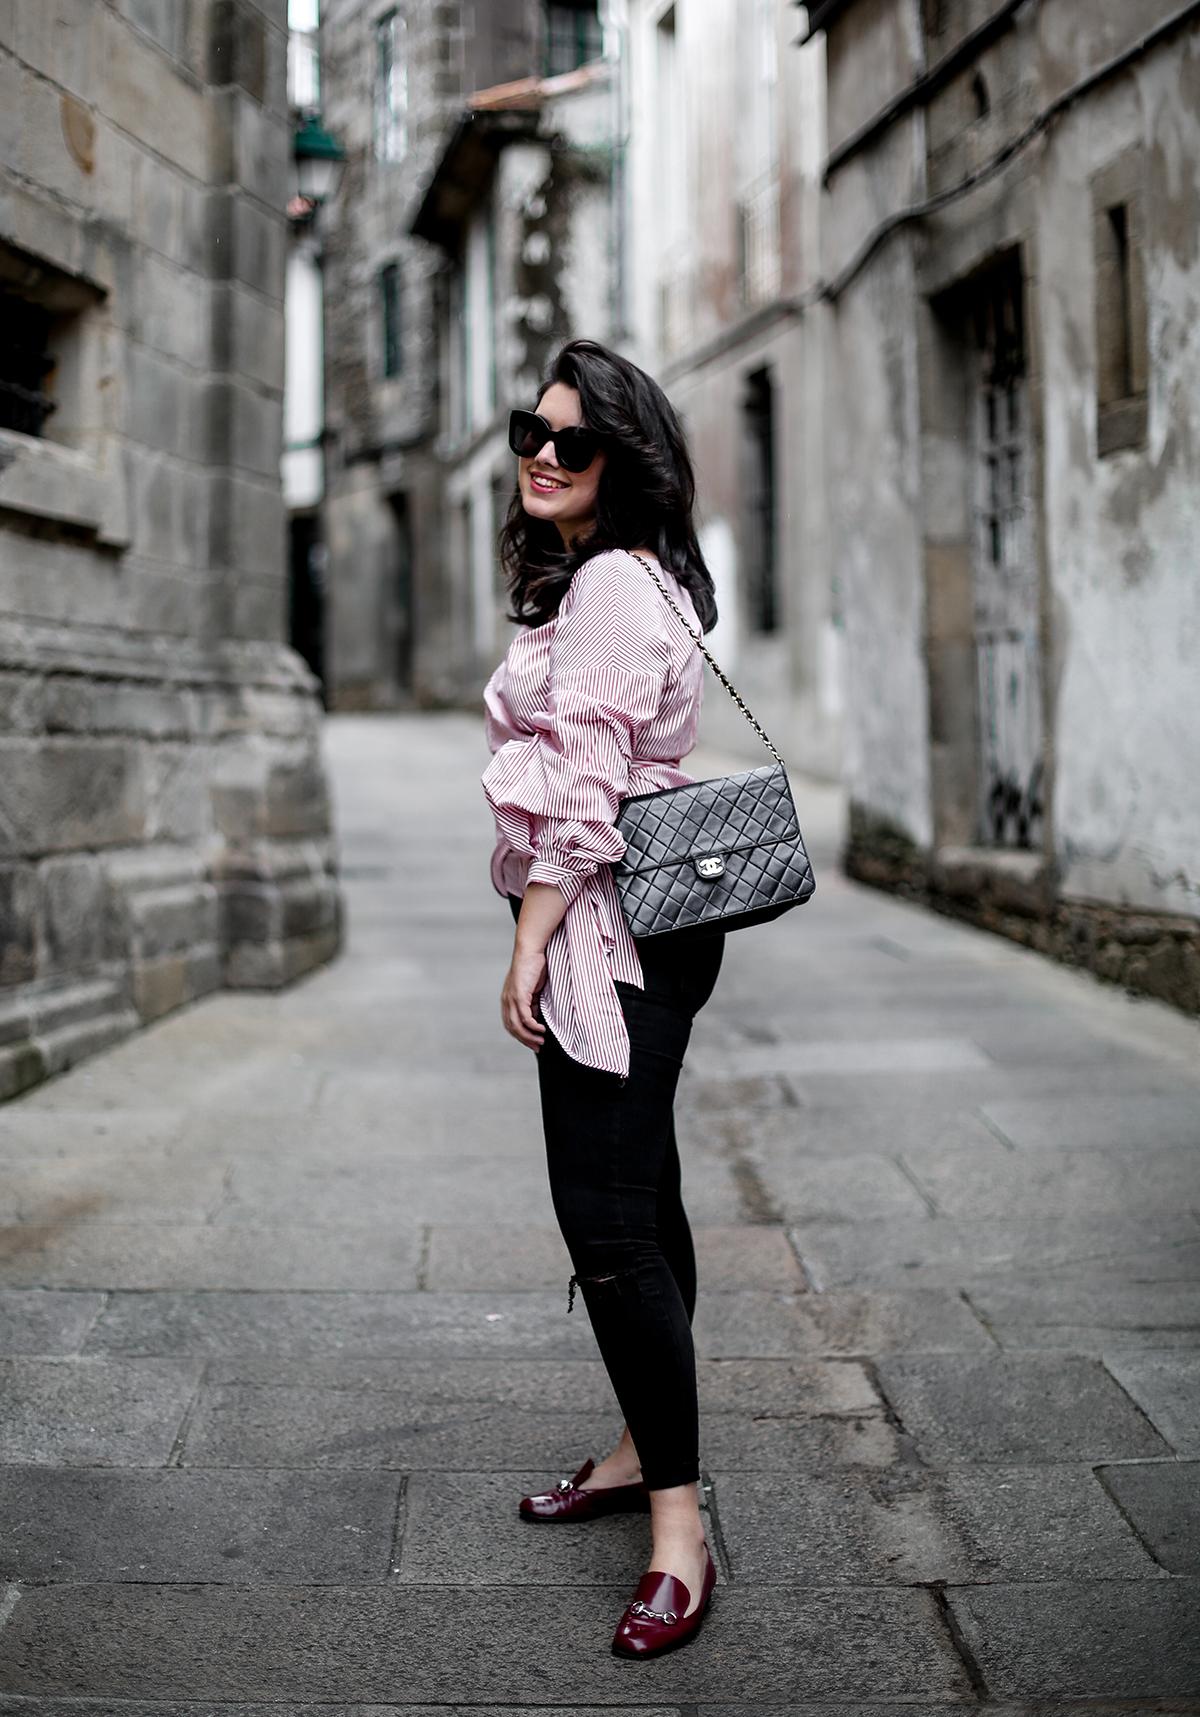 blusa-cruzada-zara-chanel-vintage-vestiaire-collective-myblueberrynightsblog10